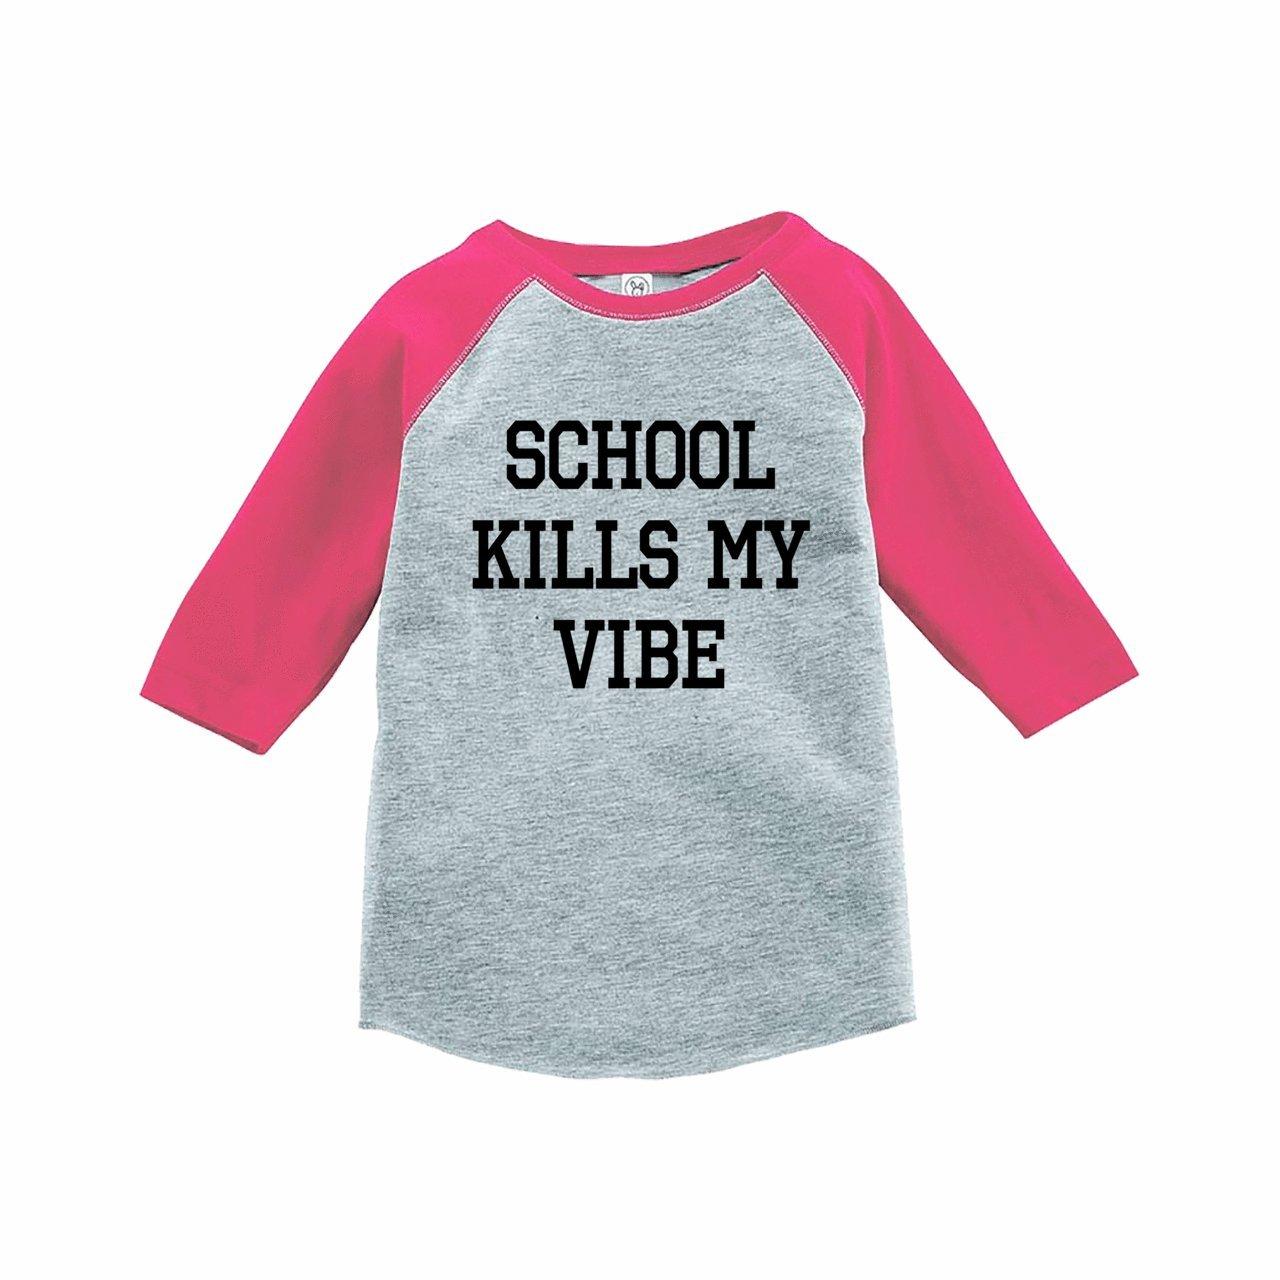 7 ate 9 Apparel Funny Kids School Vibes Baseball Tee Pink